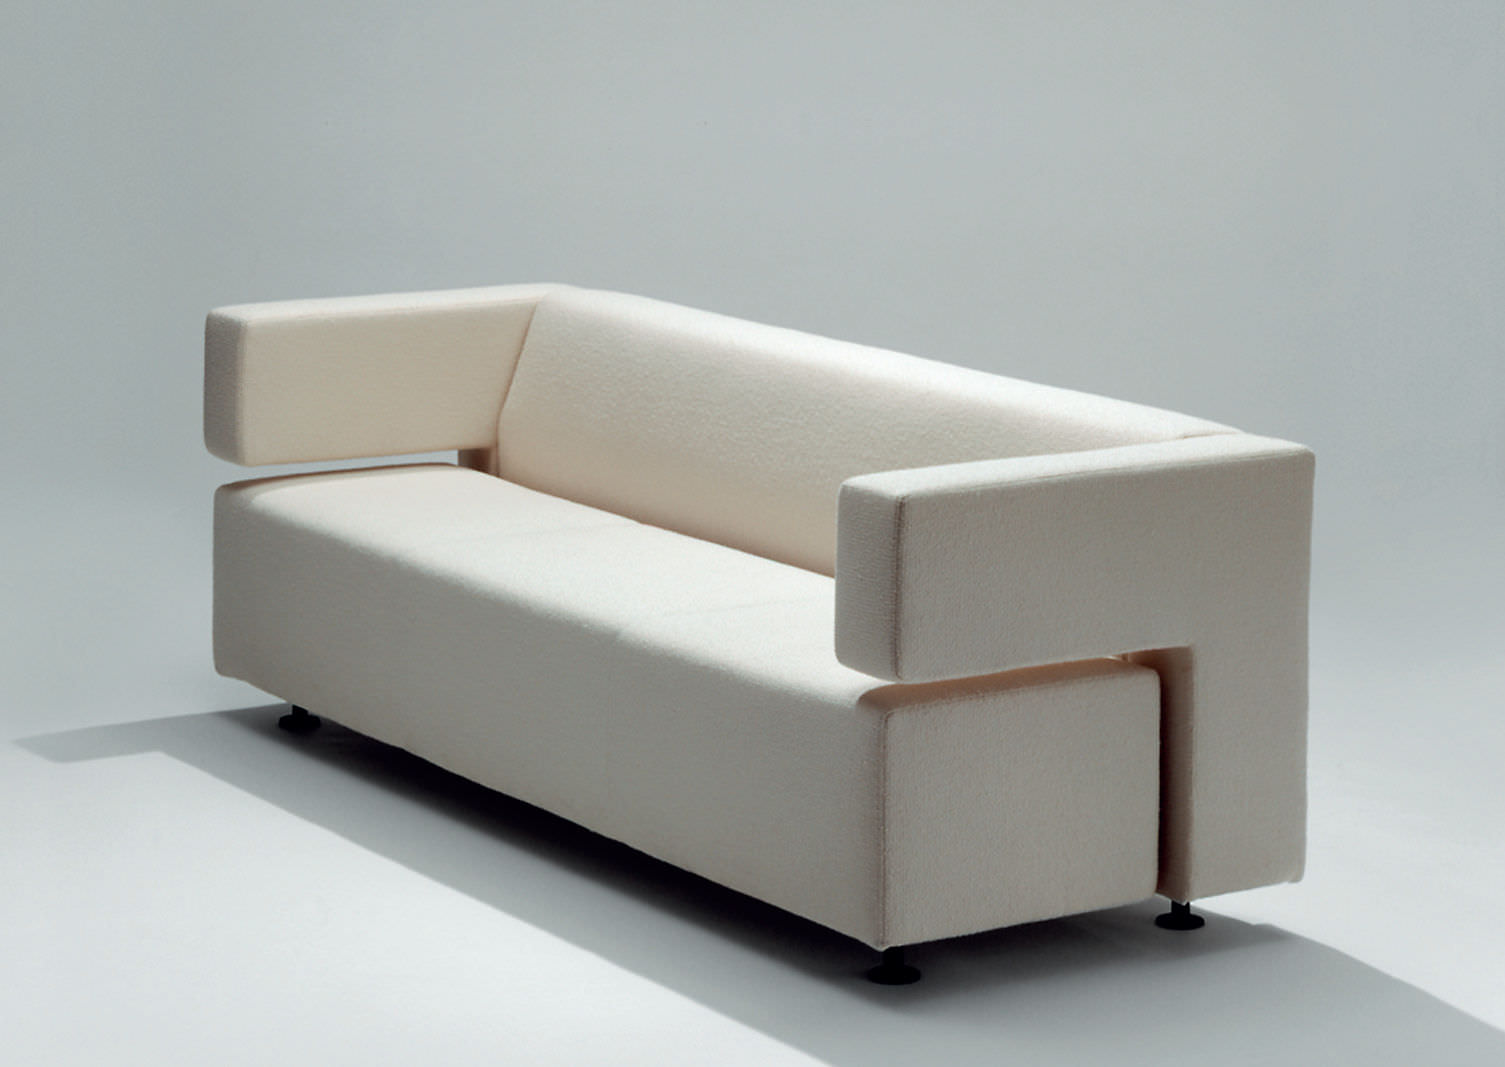 Contemporary Sofa / Leather / Fabric / 2 Seater   MILO By Jouko Järvisalo